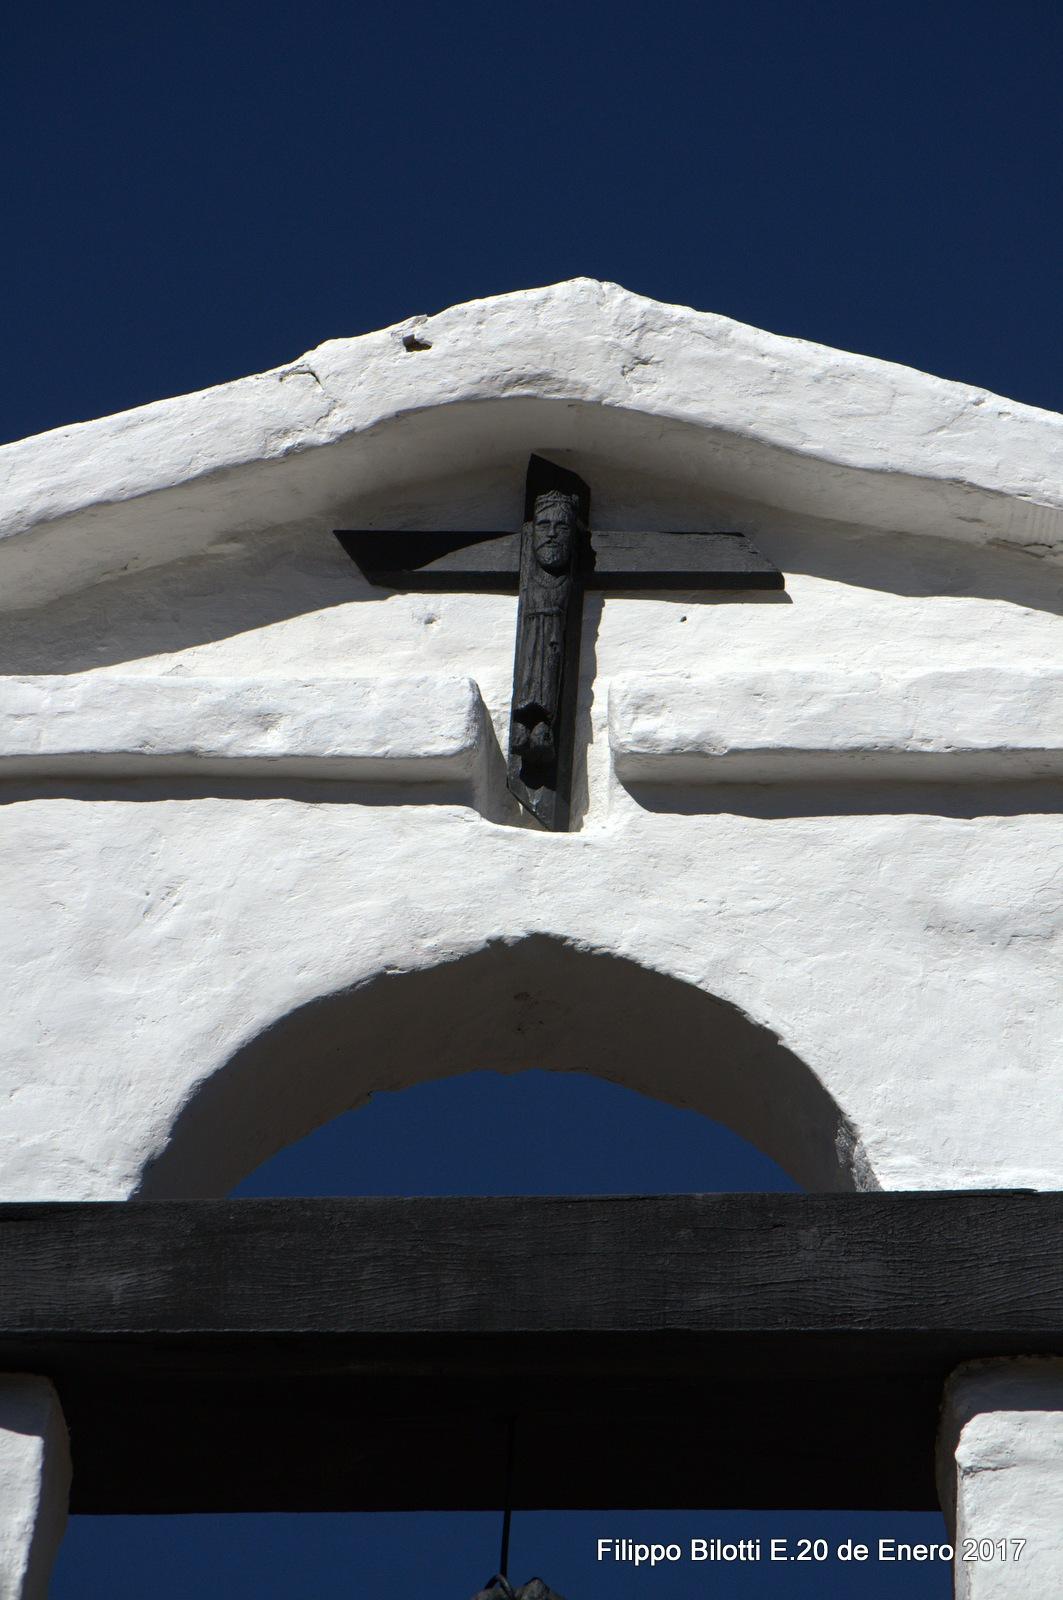 Detalle de la entrada. by FilippoBilottiE